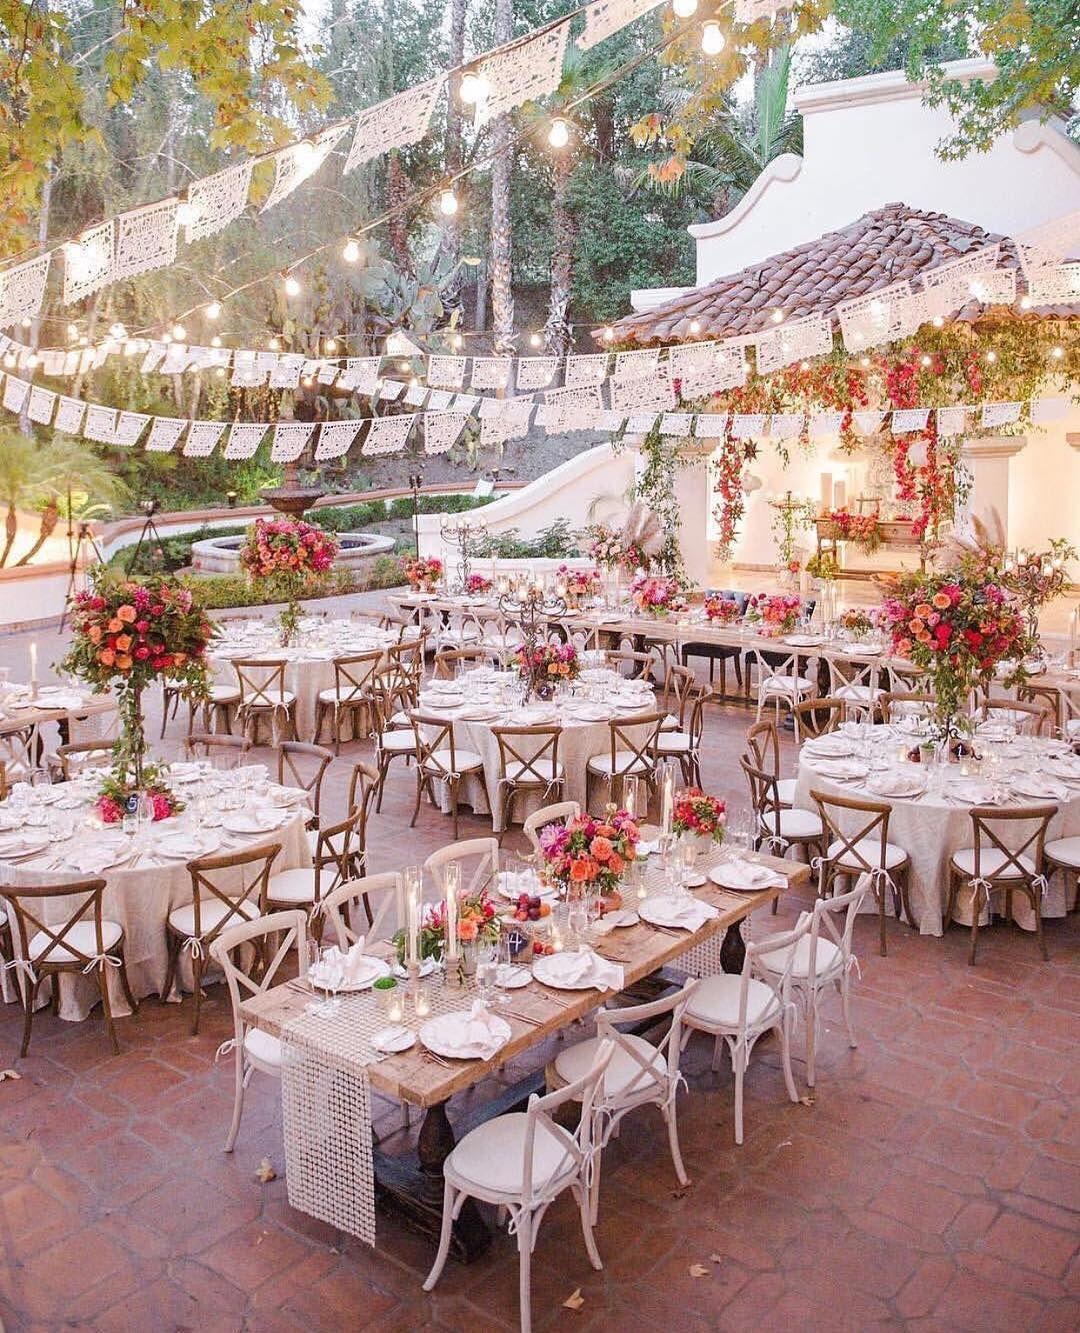 Wedding decorations to make  Make your courtyard wedding this pretty  Ravishing Receptions